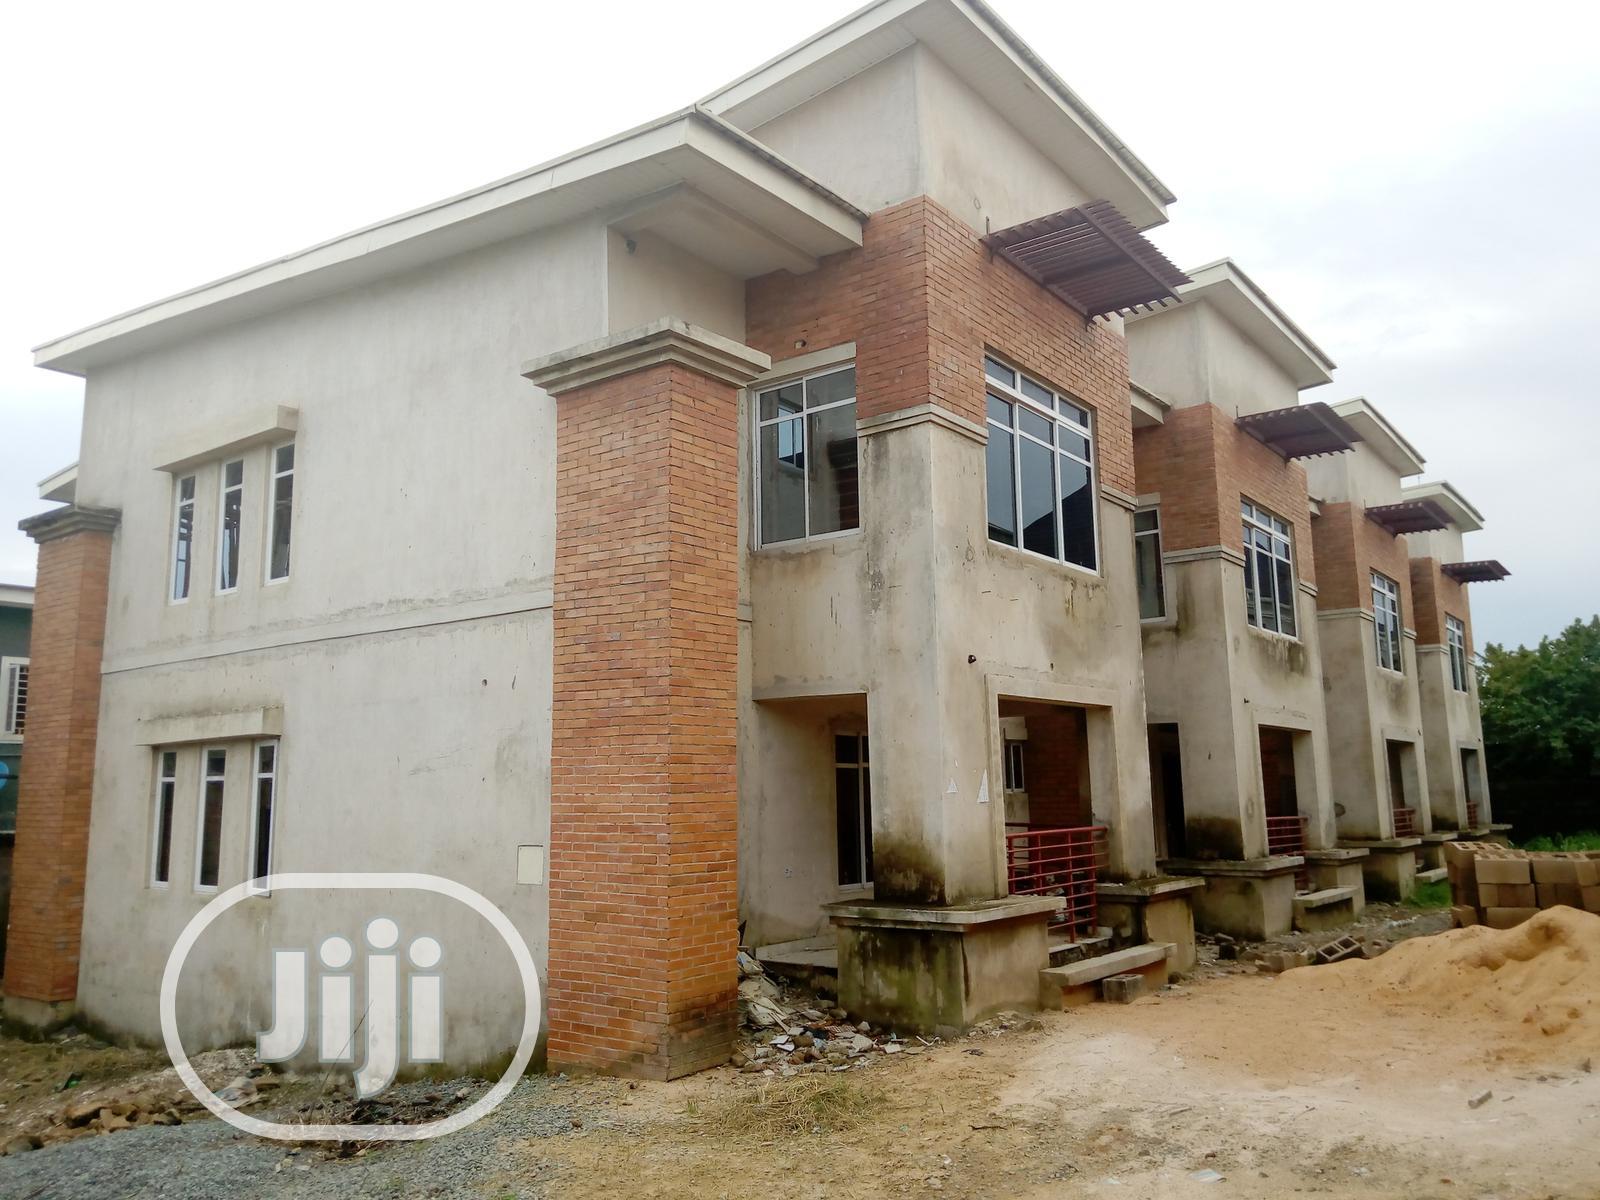 4 Units - 4-Bedroom Terrace Duplexes